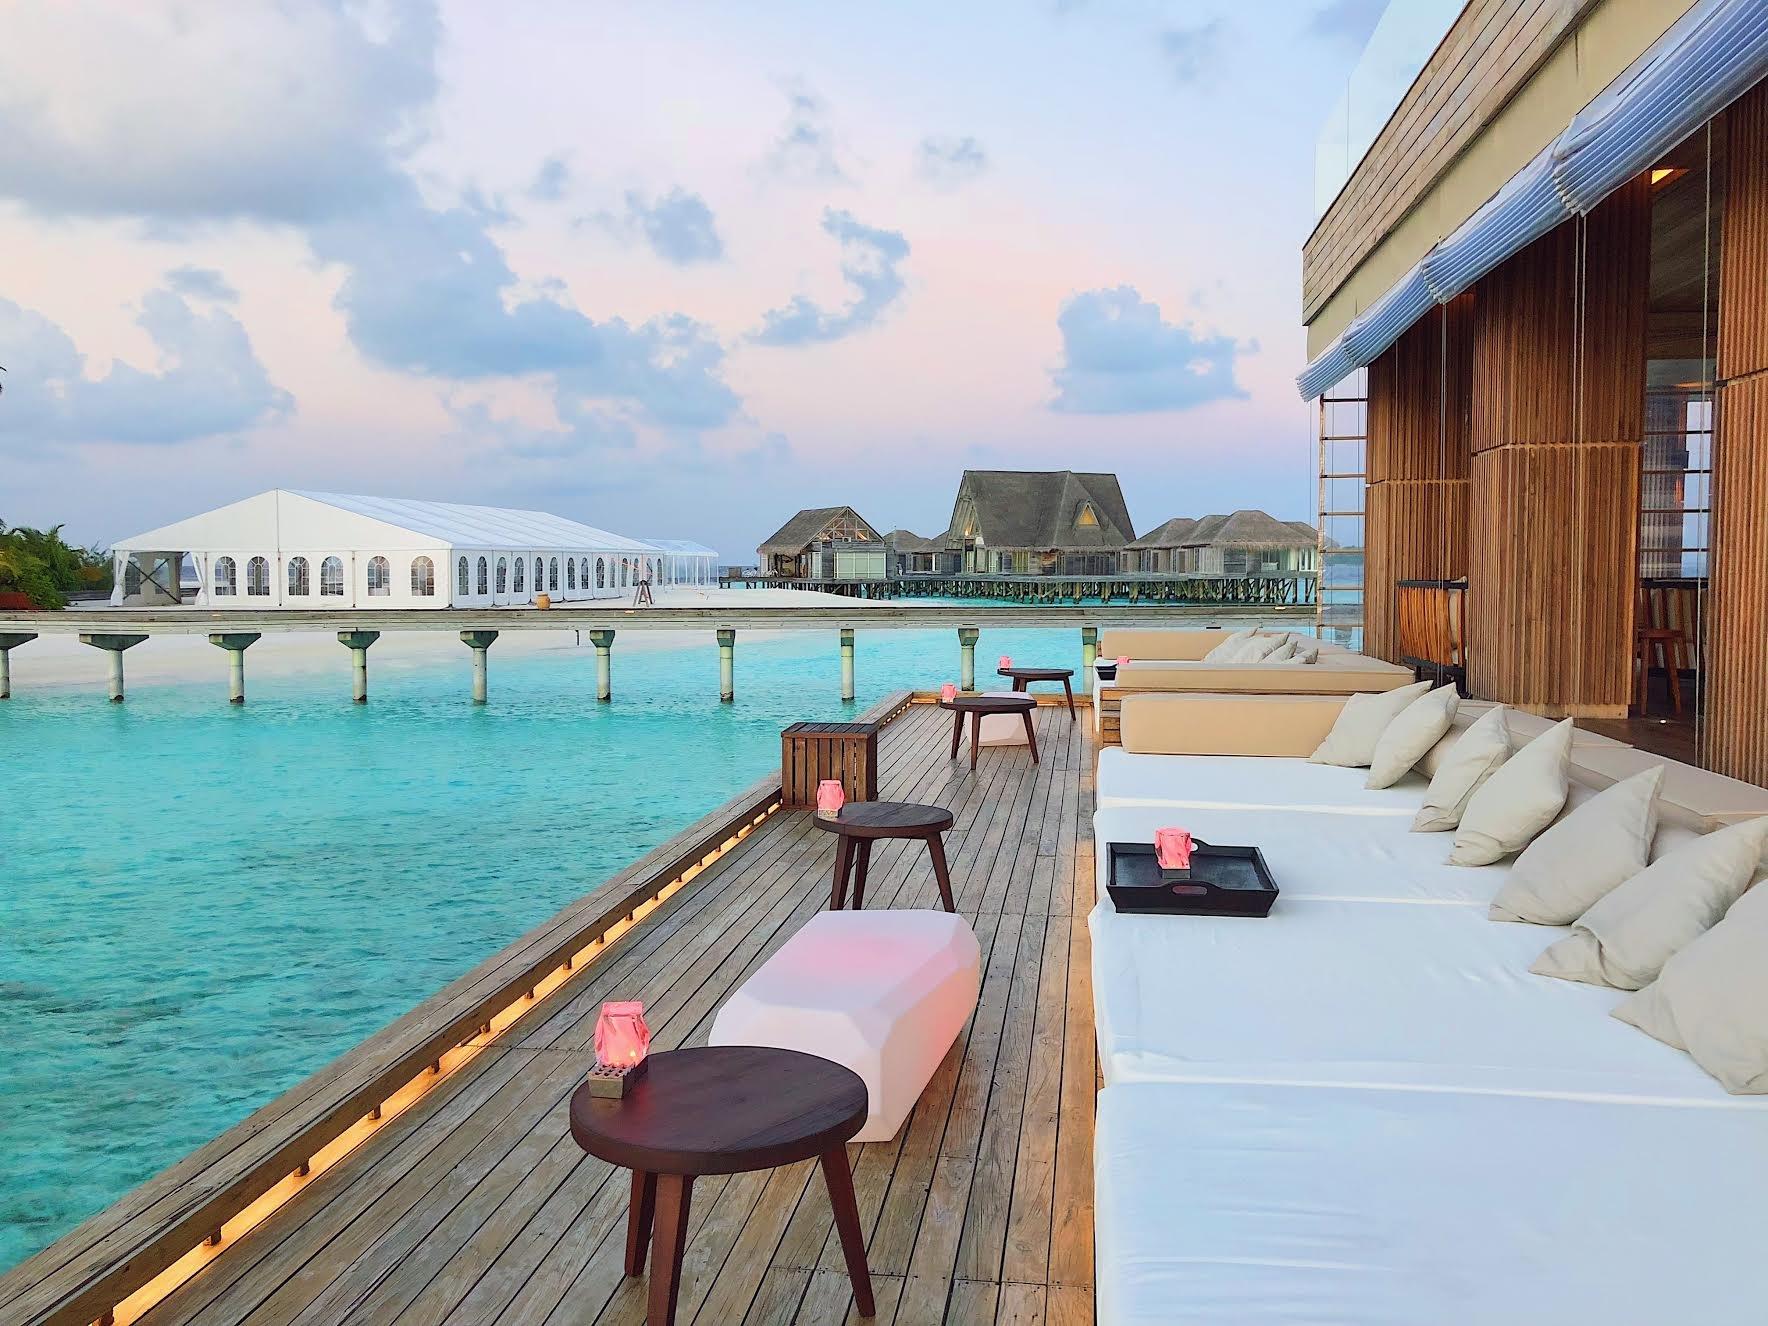 Muslim-travel-tips-Maldives-things-to-do-stargazing-lounge